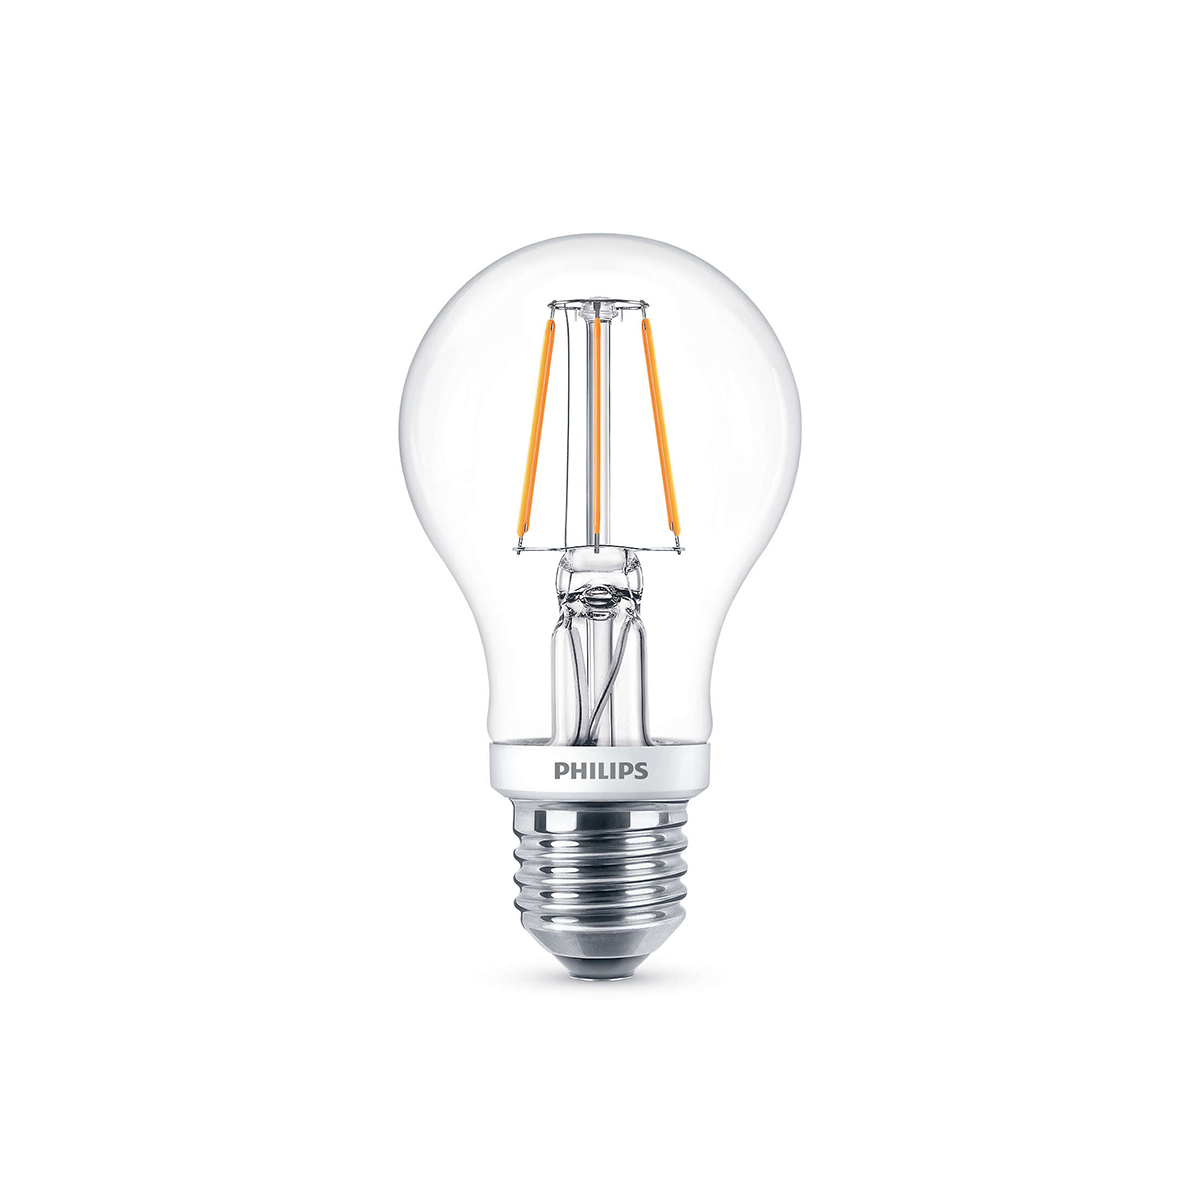 philips leuchtmittel led classic lampe e27 5 w warmwei dimmbar. Black Bedroom Furniture Sets. Home Design Ideas